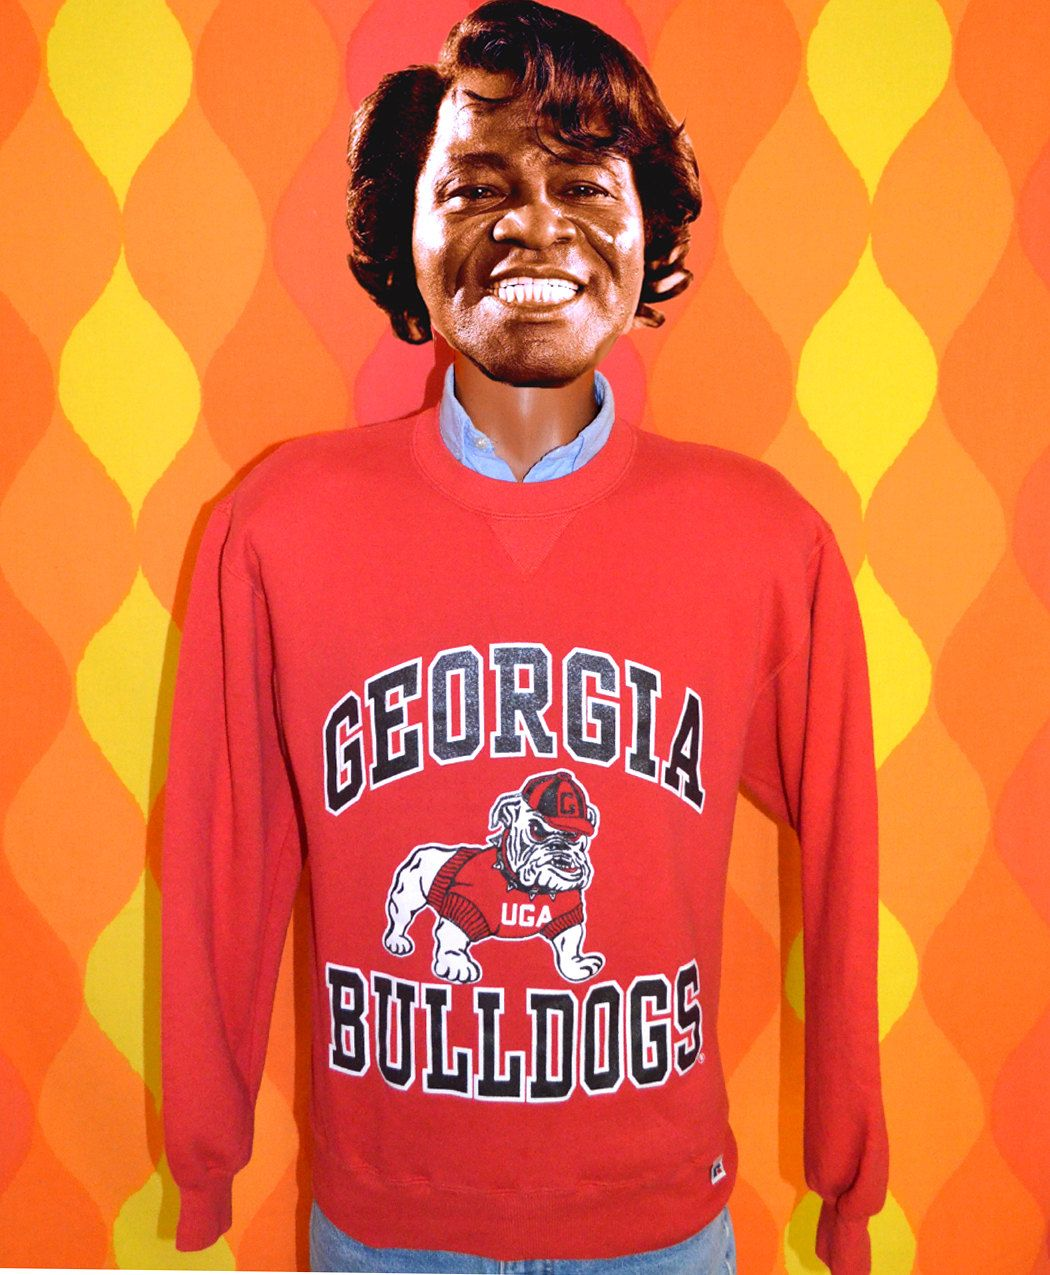 Vintage 80s Sweatshirt University Of Georgia Uga Bulldogs Etsy 80s Sweatshirt Bulldog Sweatshirt Sweatshirts [ 1275 x 1050 Pixel ]